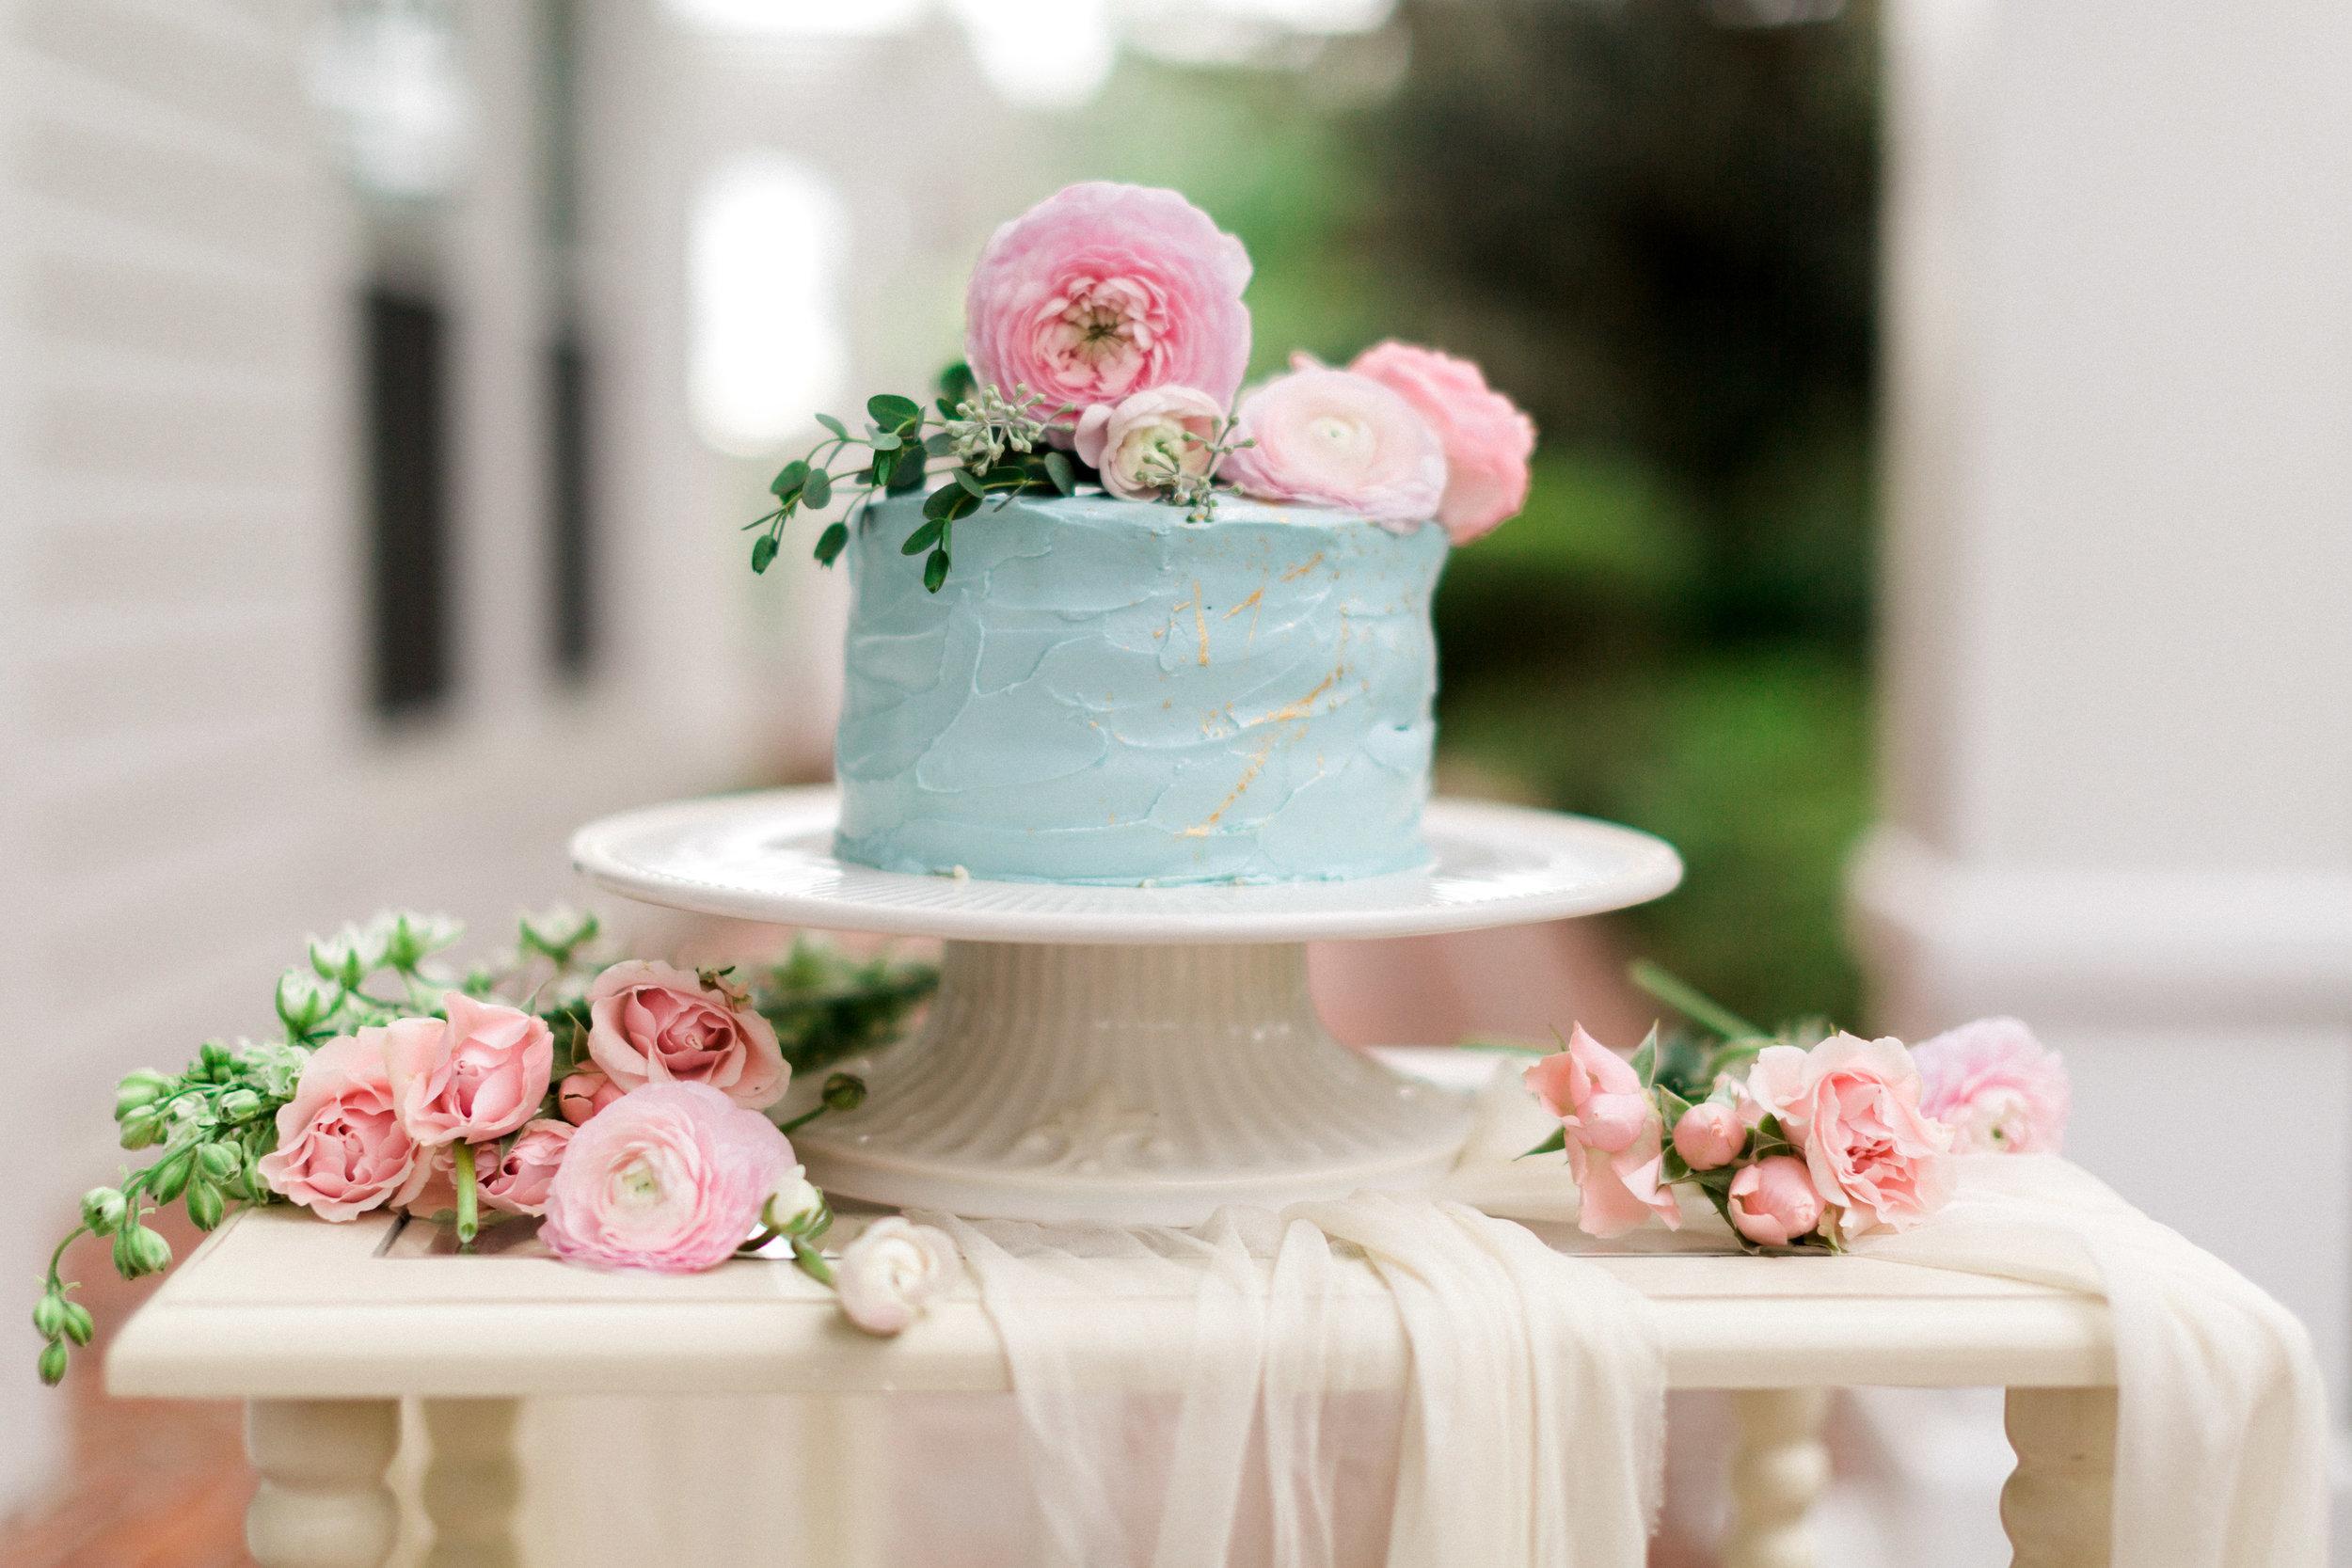 cypress grove estate house, orlando florida wedding photo shoot, cake and flowers